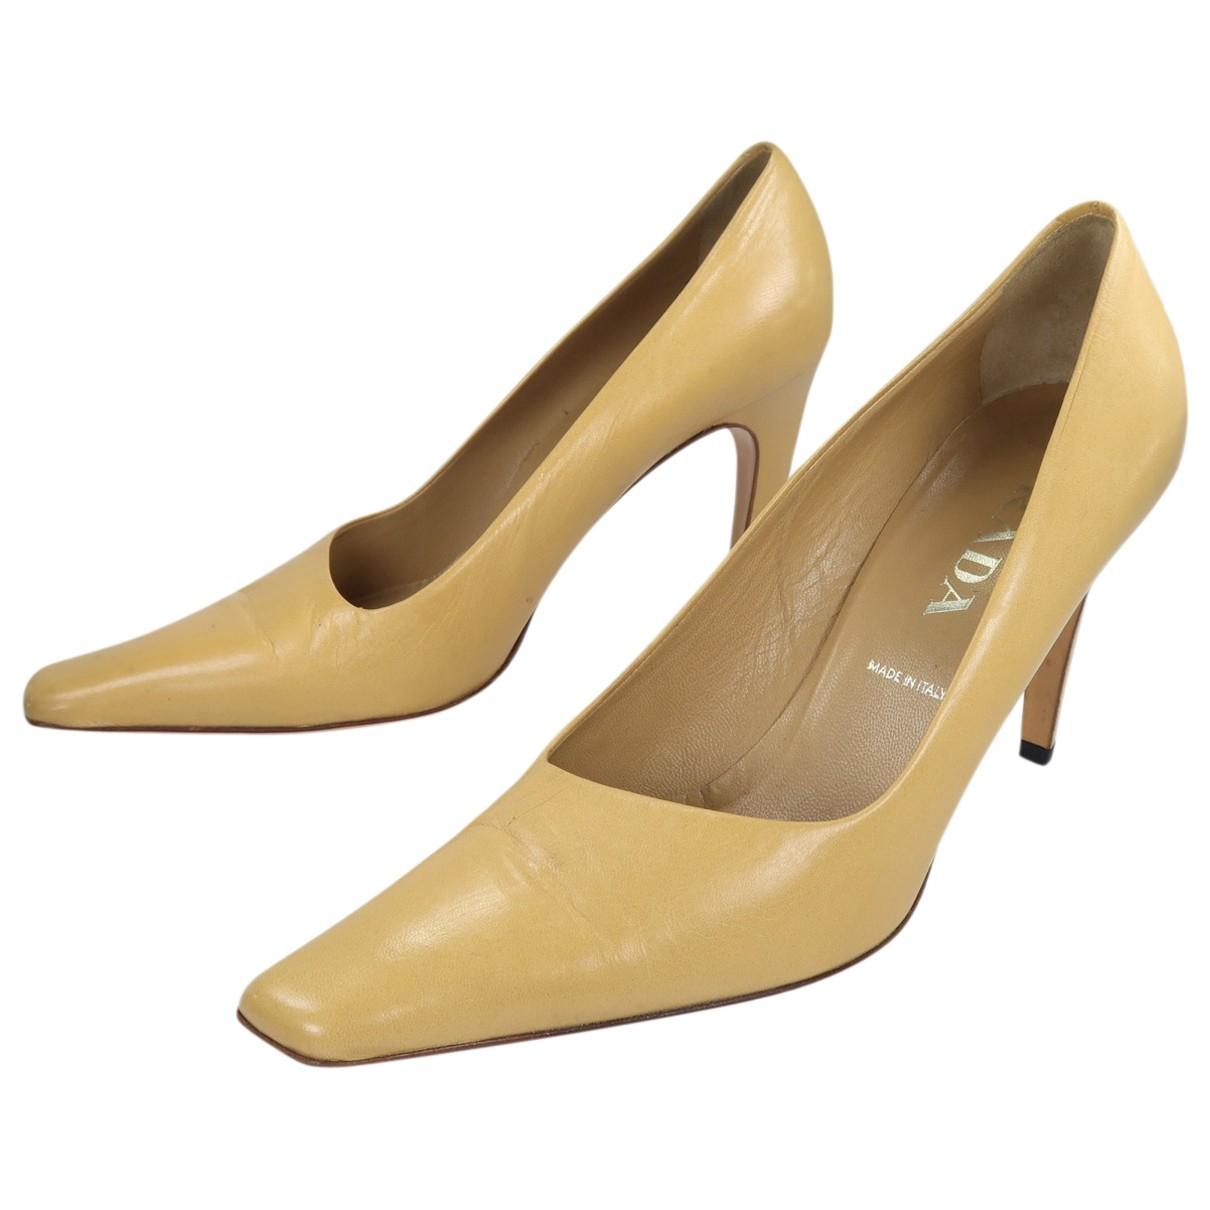 Prada - Escarpins   pour femme en cuir - camel